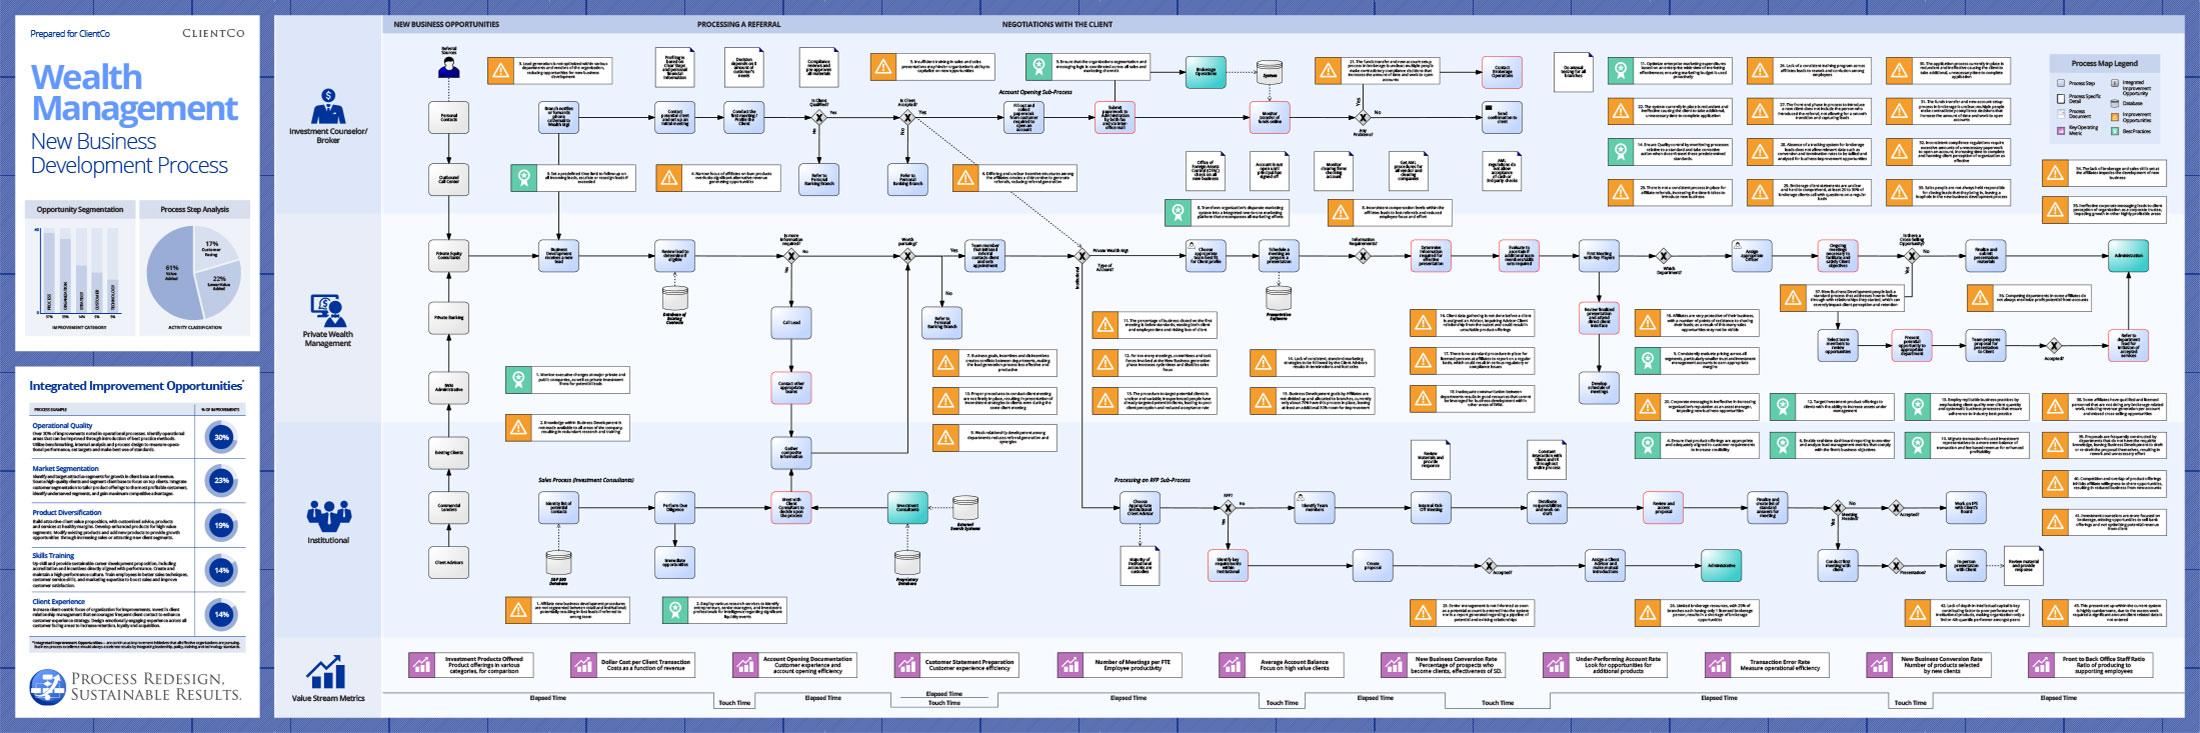 Wealth Management - New Business Development Process